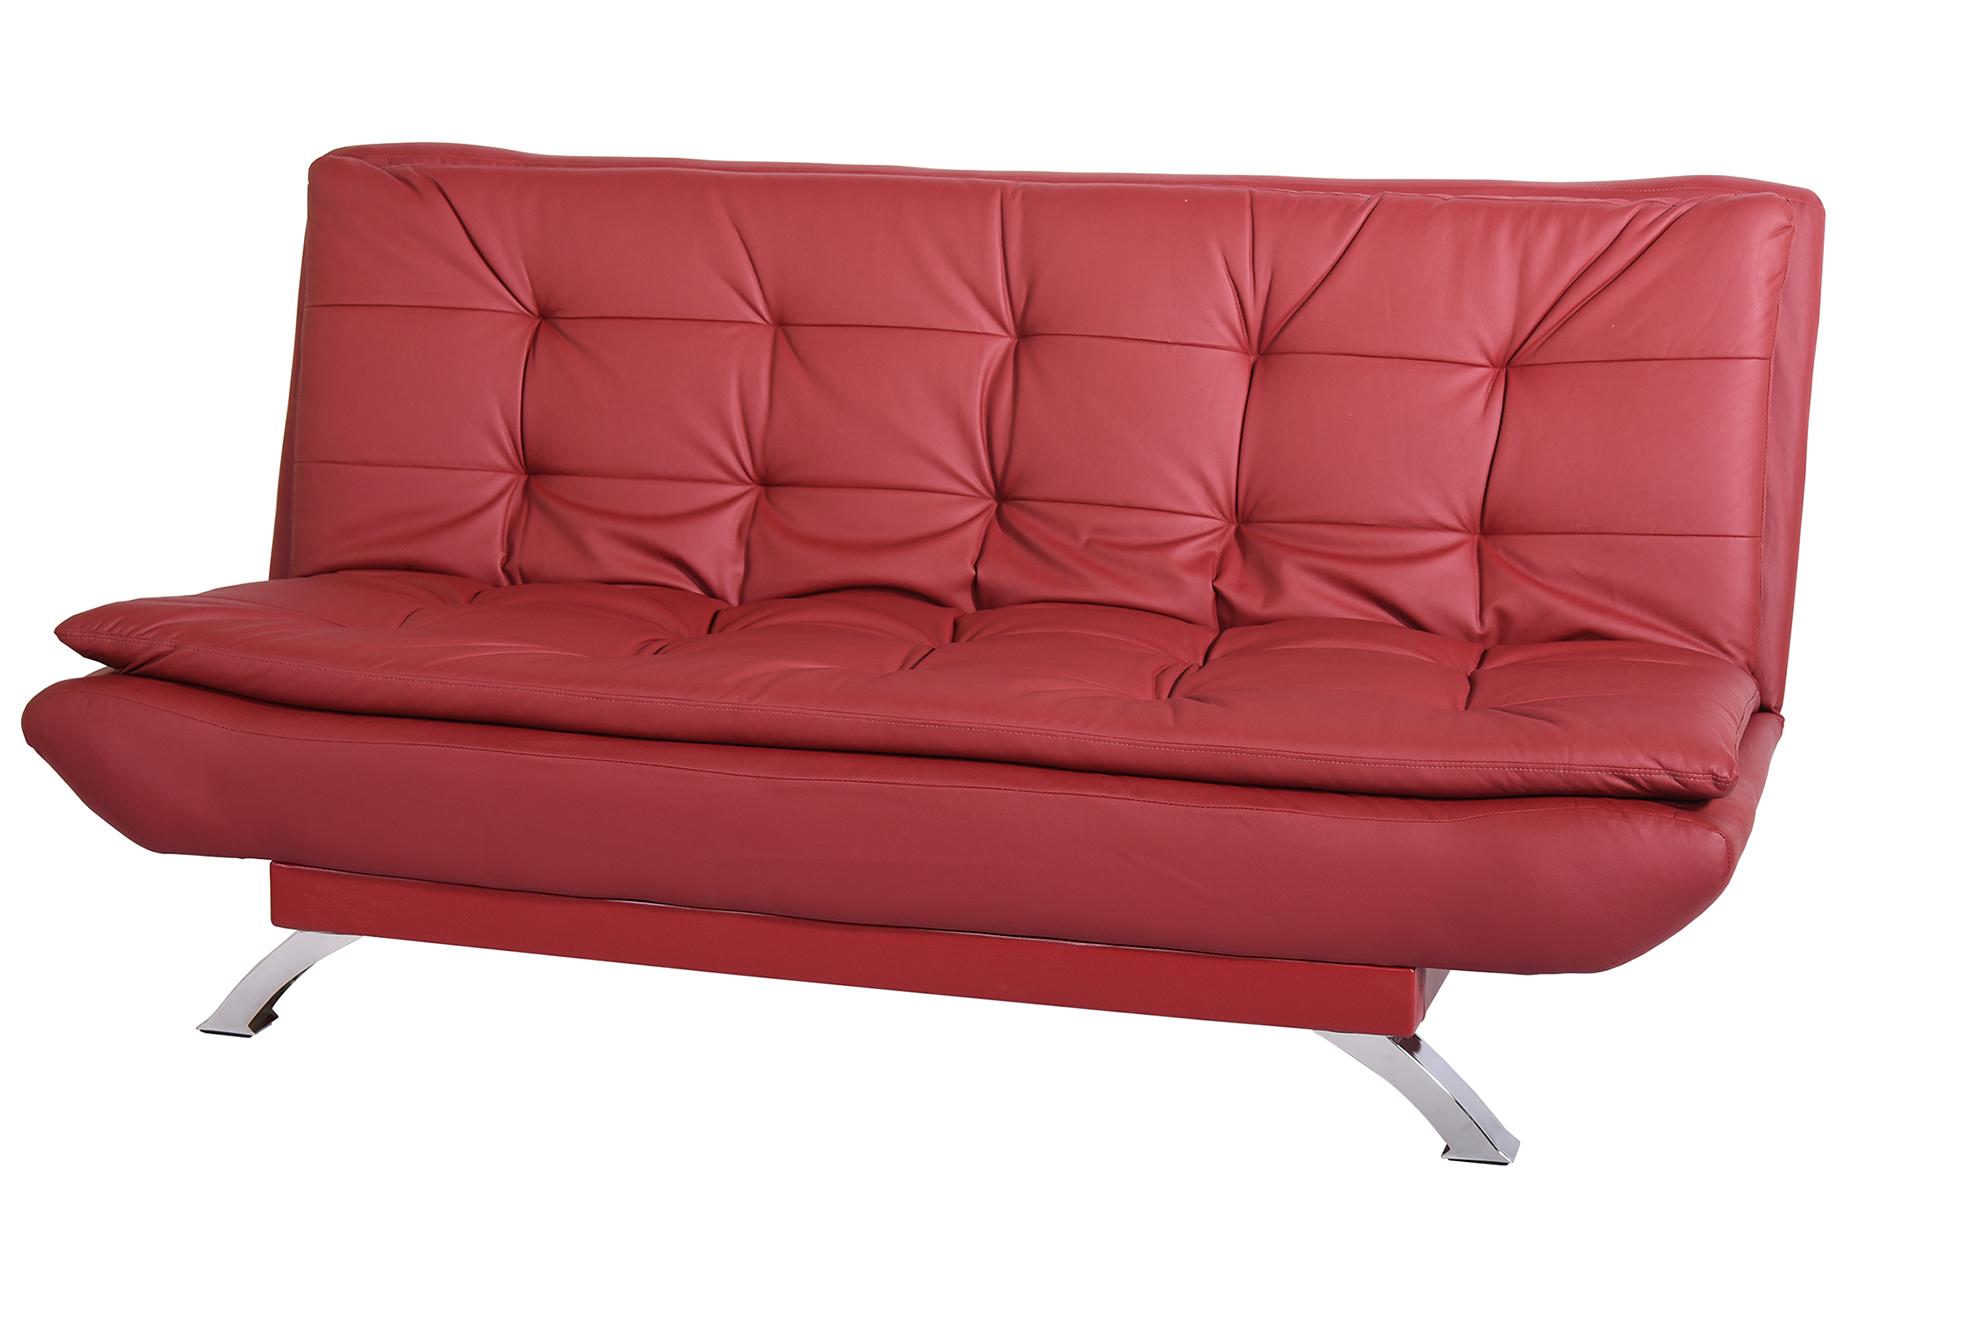 stunning Affordable Sleeper Sofa Part - 2: Tanya Sleeper Couch